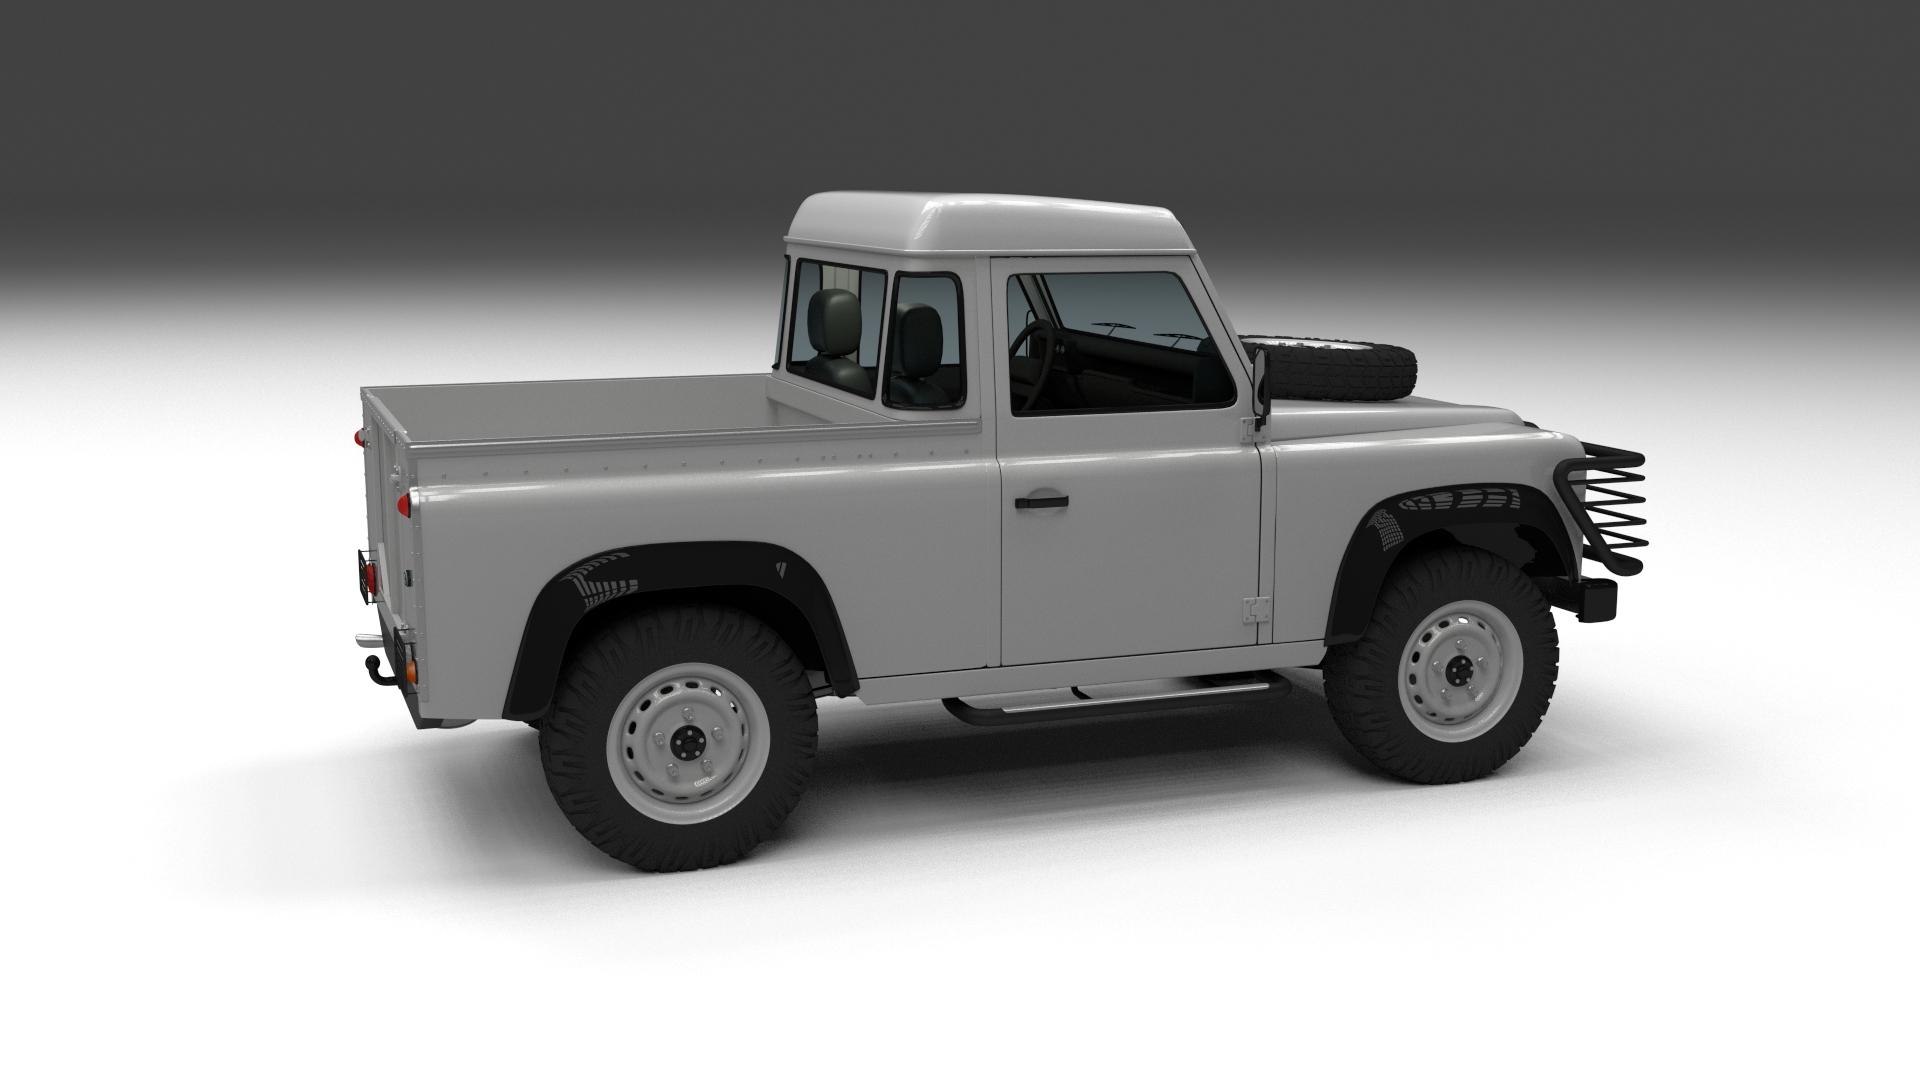 land rover defender 90 pick up w interior hdri by dragosburian 3docean. Black Bedroom Furniture Sets. Home Design Ideas